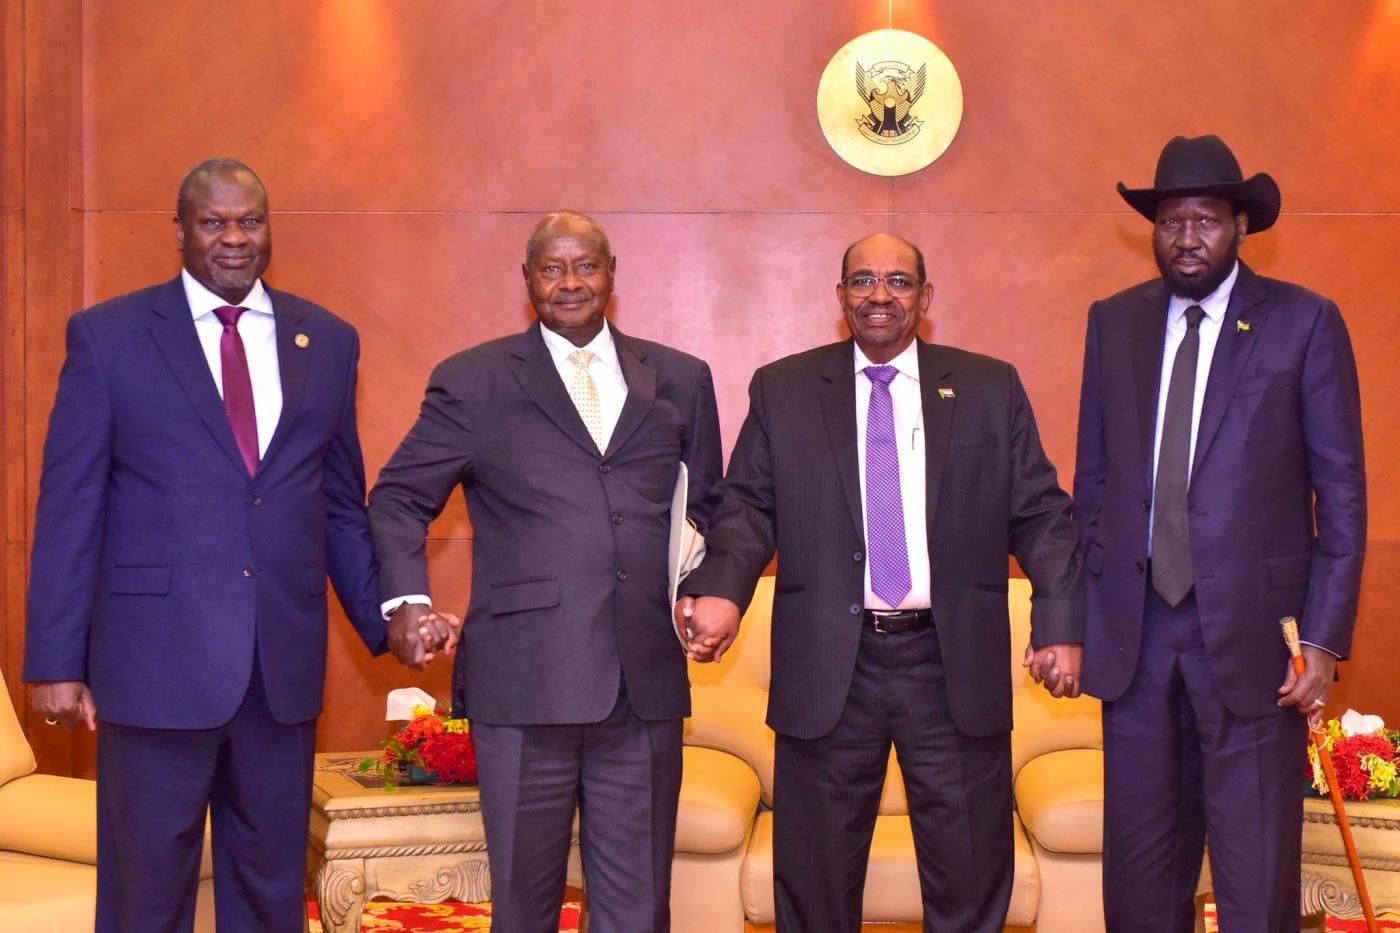 Dr Riek Machar, on extreme left, H.E President Yoweri Museveni, Next to Dr. Riek Machar, H.E President Omar Al Bashir, on the right of President Yoweri Museveni, H.E President Salva Kiir, on the extreme right in Khartoum on June 24th 2018 for South Sudan Peace Talks.(Photo: file/supplied/Nyamilepedia)